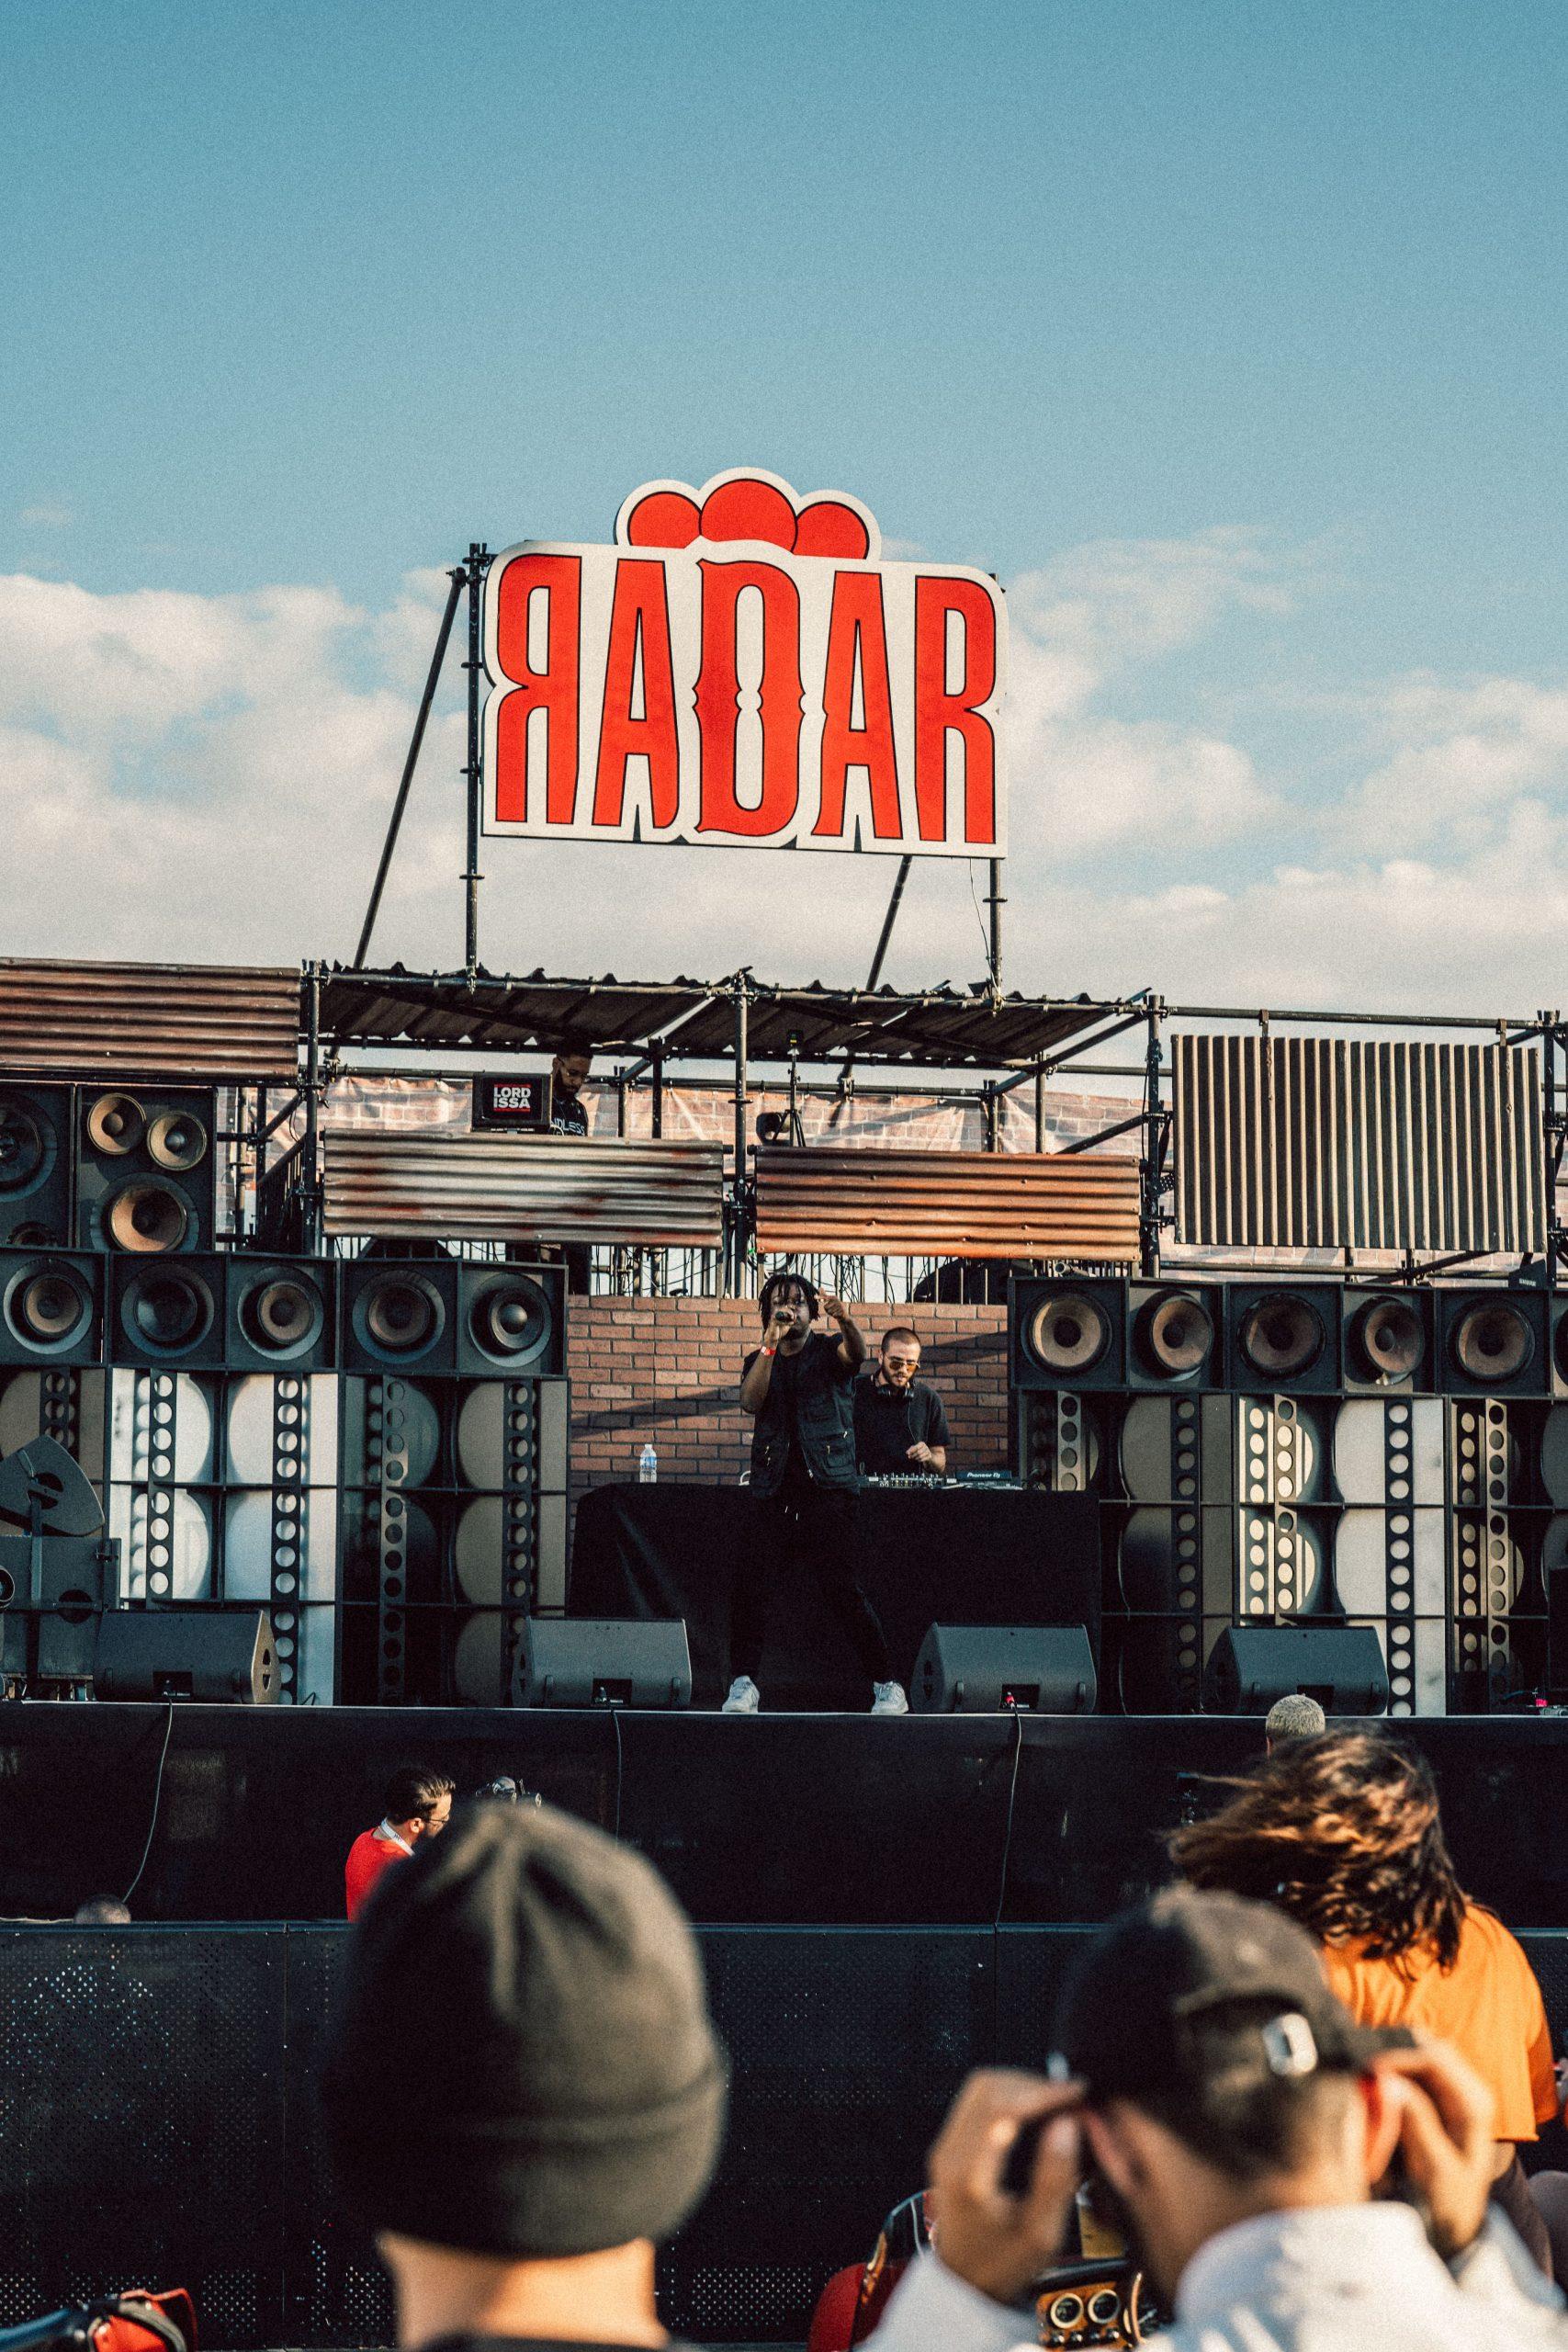 RADAR-9-min